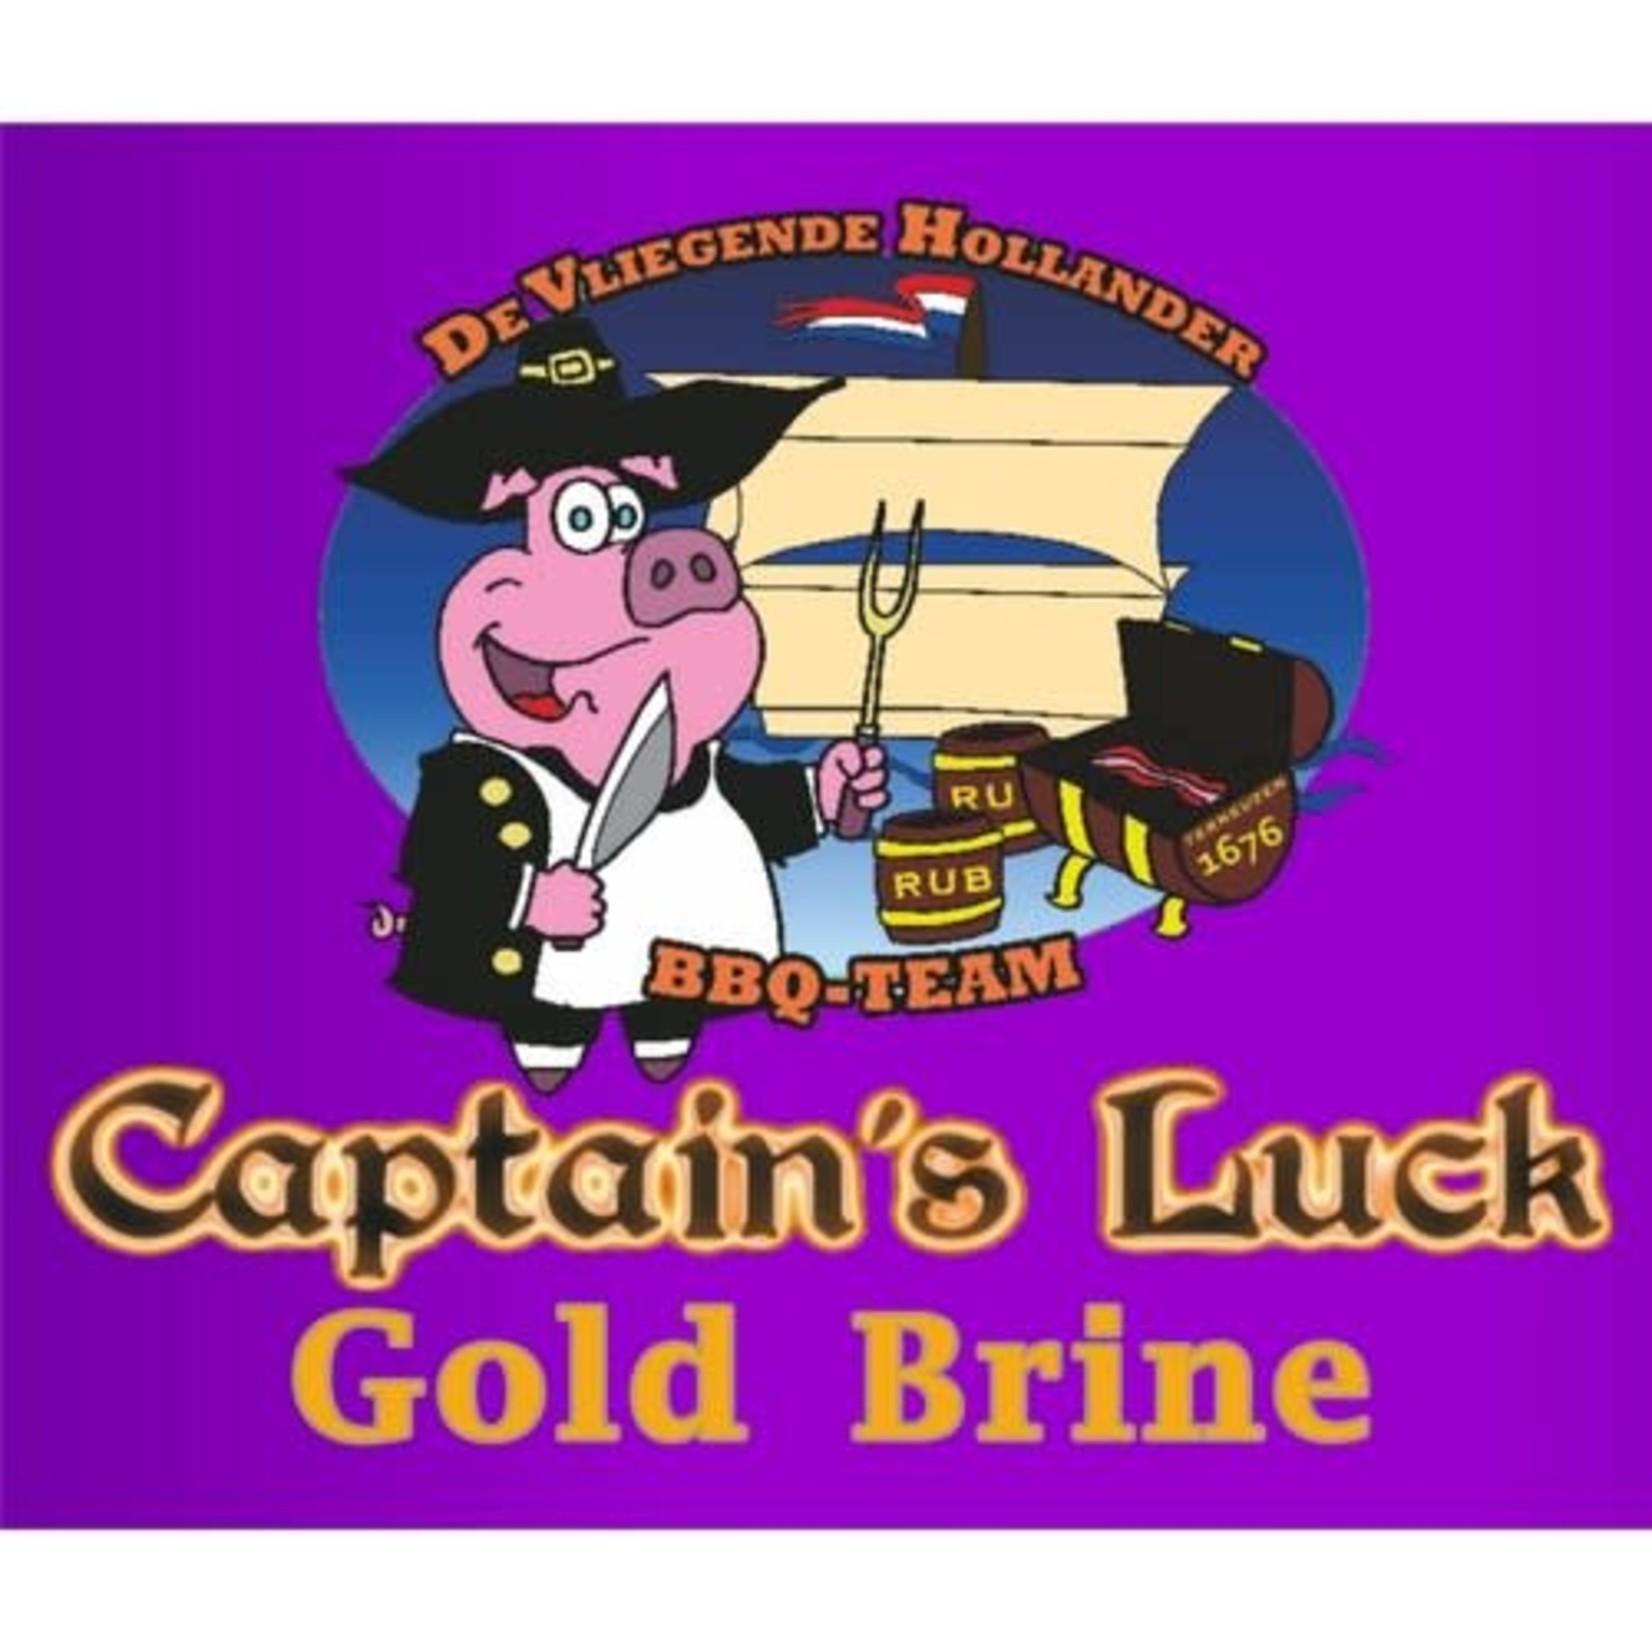 Captain's Luck Captain's Luck Gold Brine 6 kg